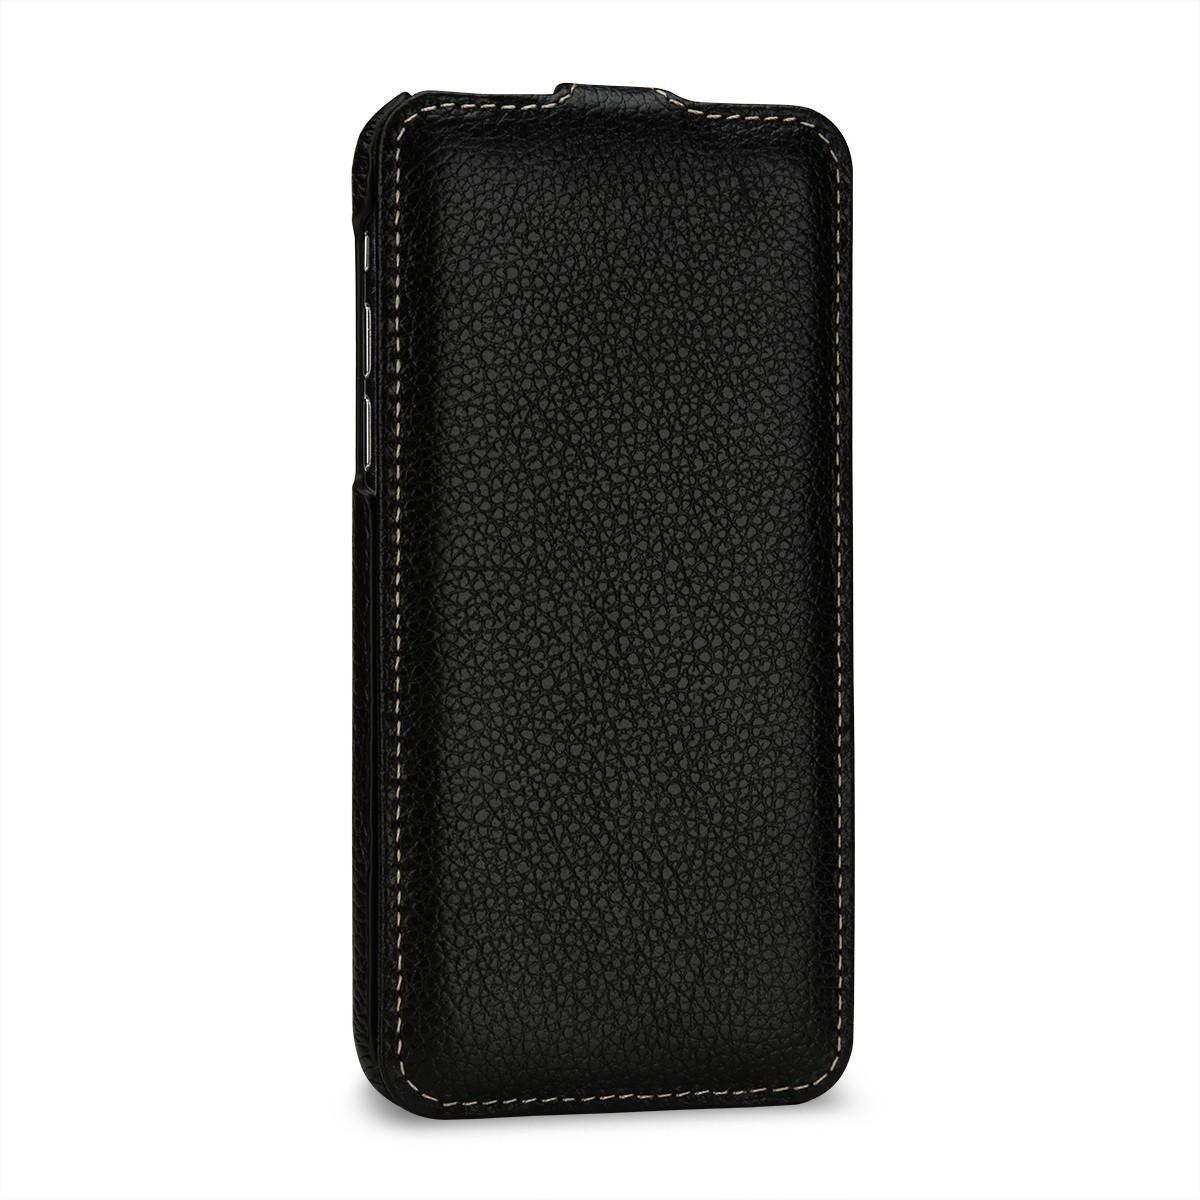 Etui iPhone X ultraslim grainé noir en cuir véritable - Stilgut